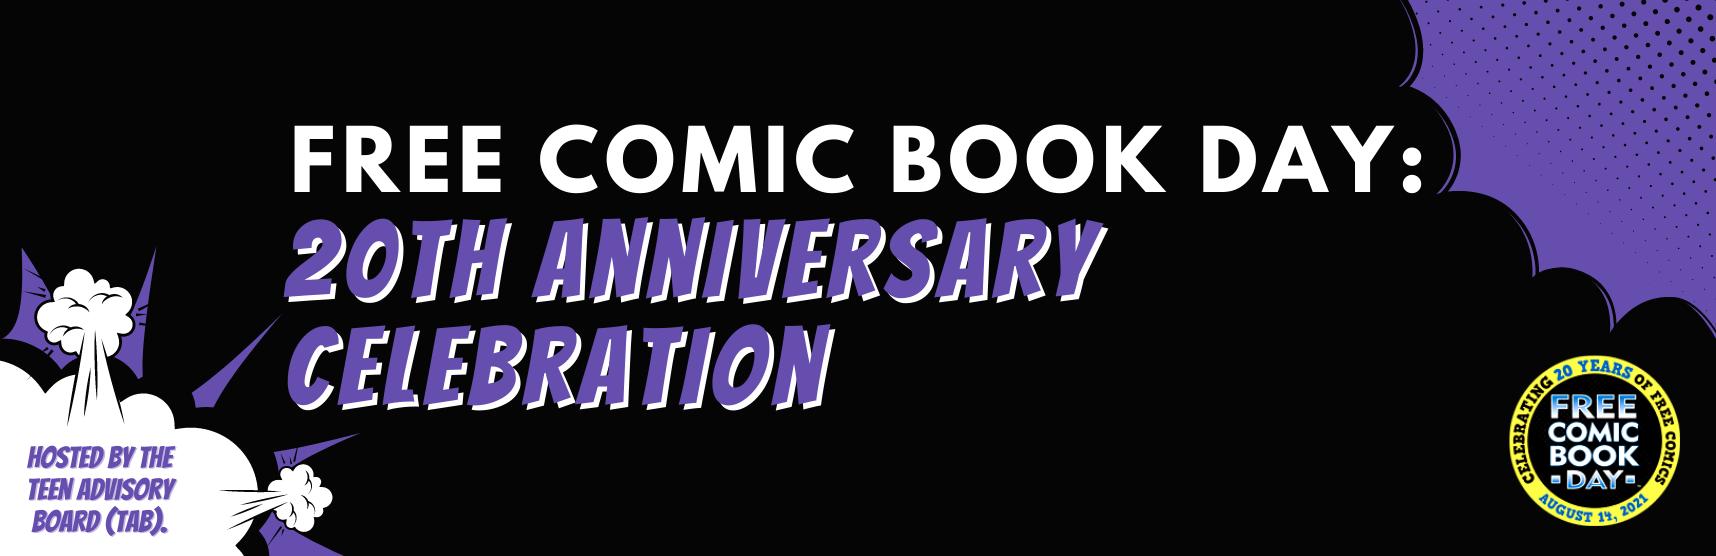 Free Comic Book Day: 20th Anniversary Celebration